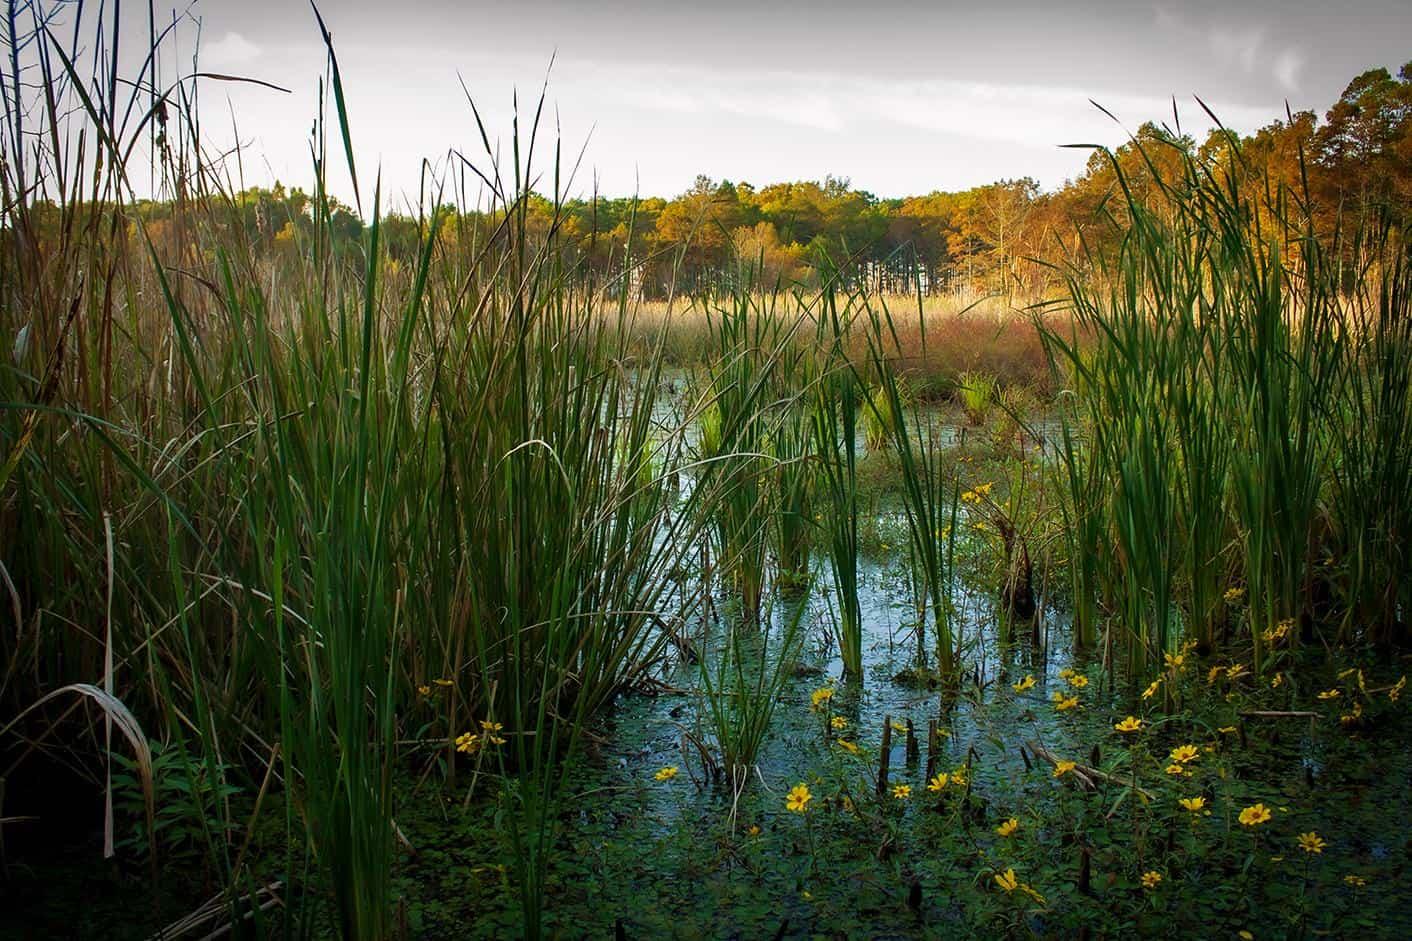 north carolina usa mattamuskeet national wildlife refuge reed banks